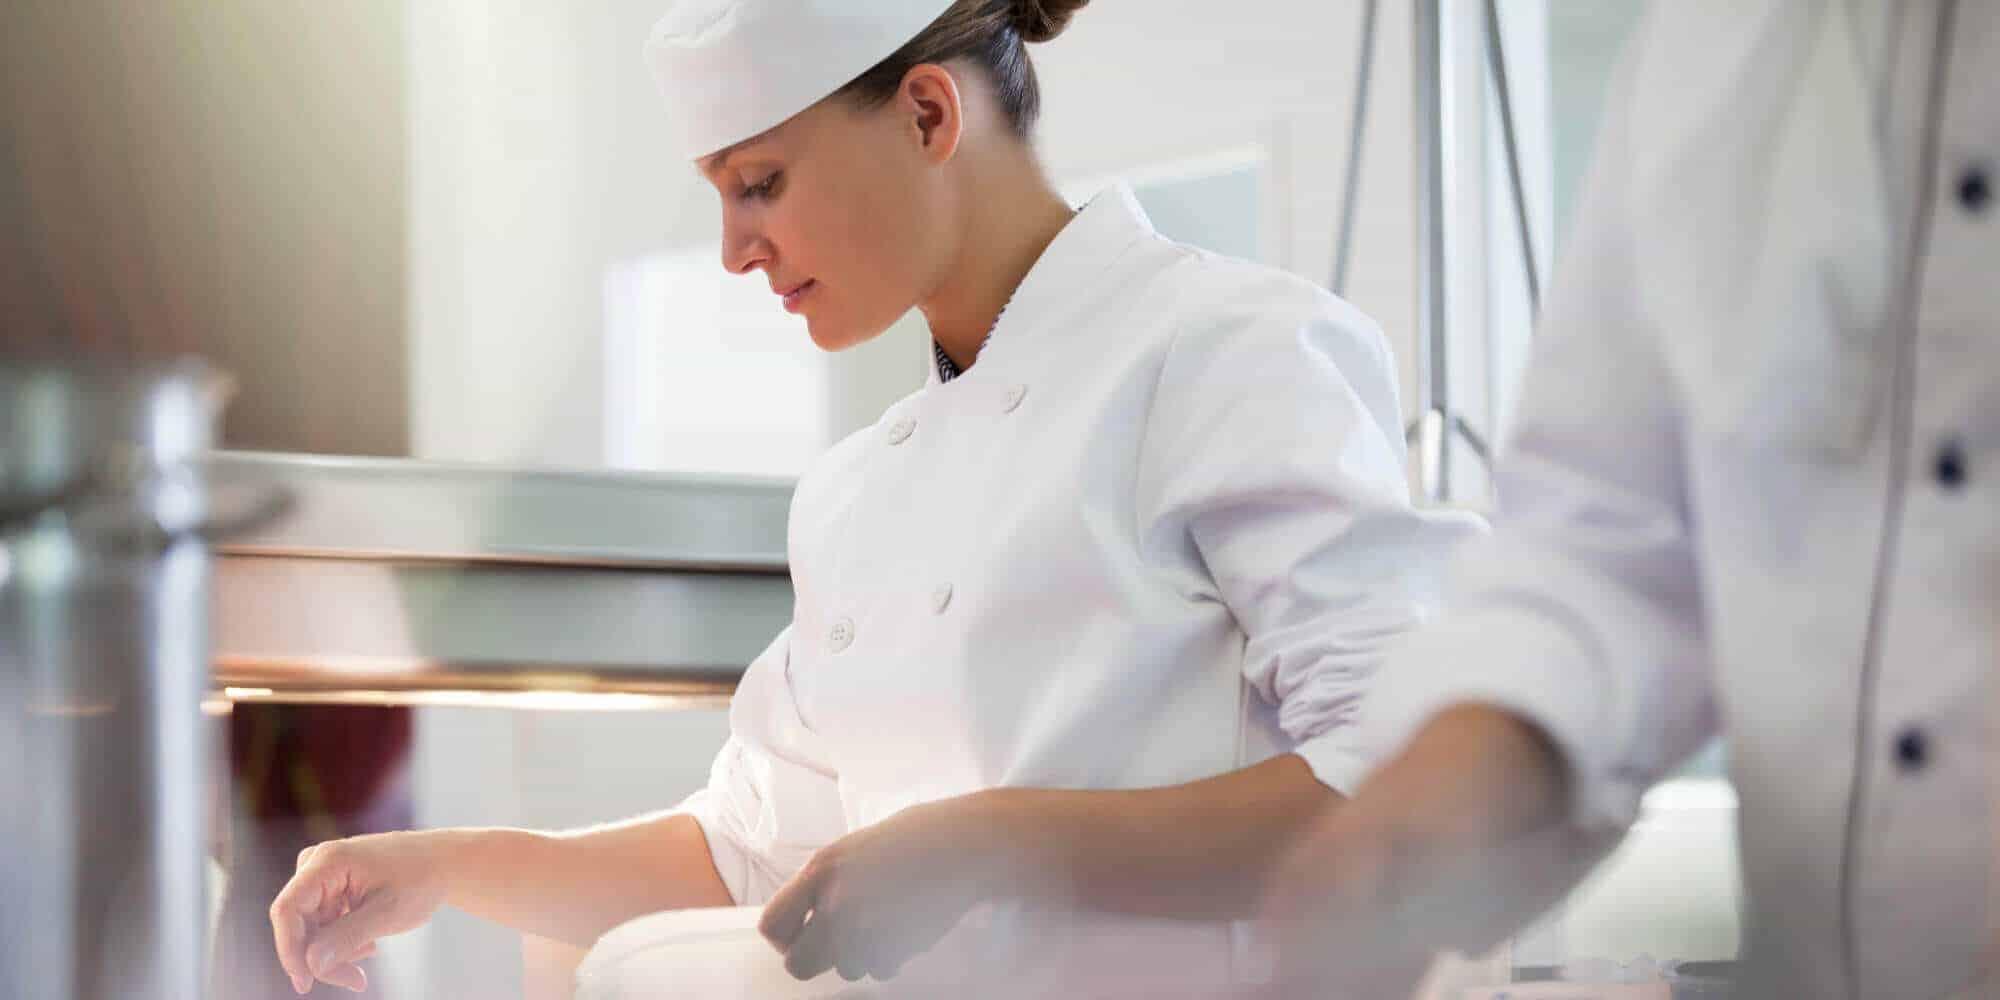 Use This Prep Cook Job Description Today Wonolo